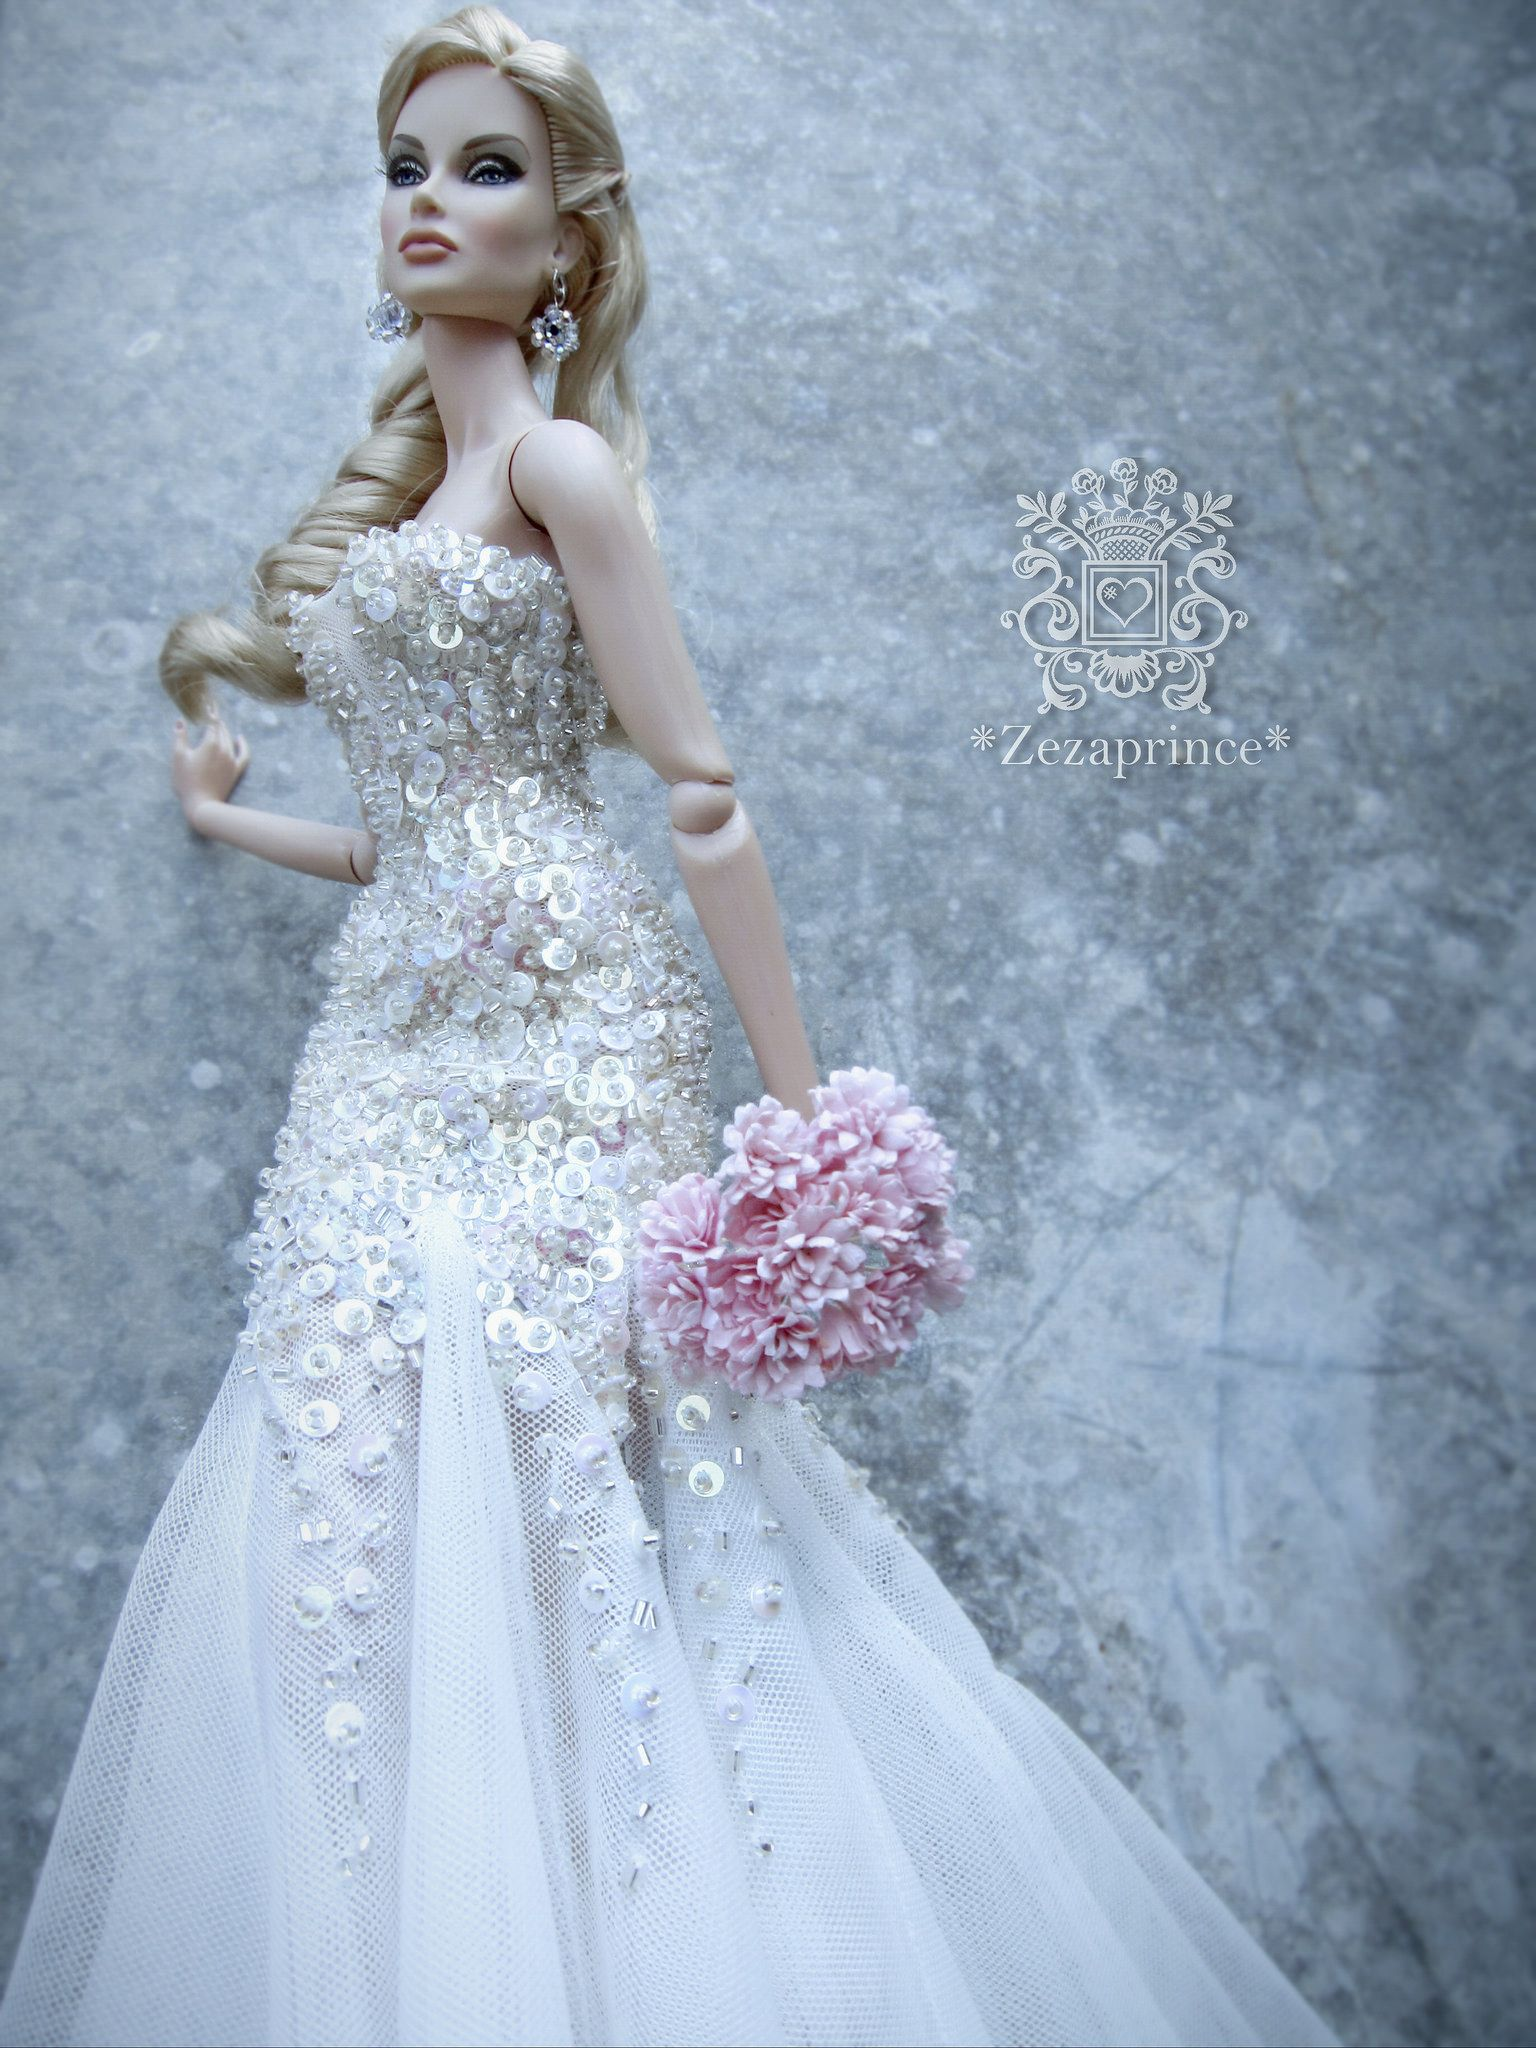 https://flic.kr/p/r679cq | Sin título | Wedding dresses for dolls ...